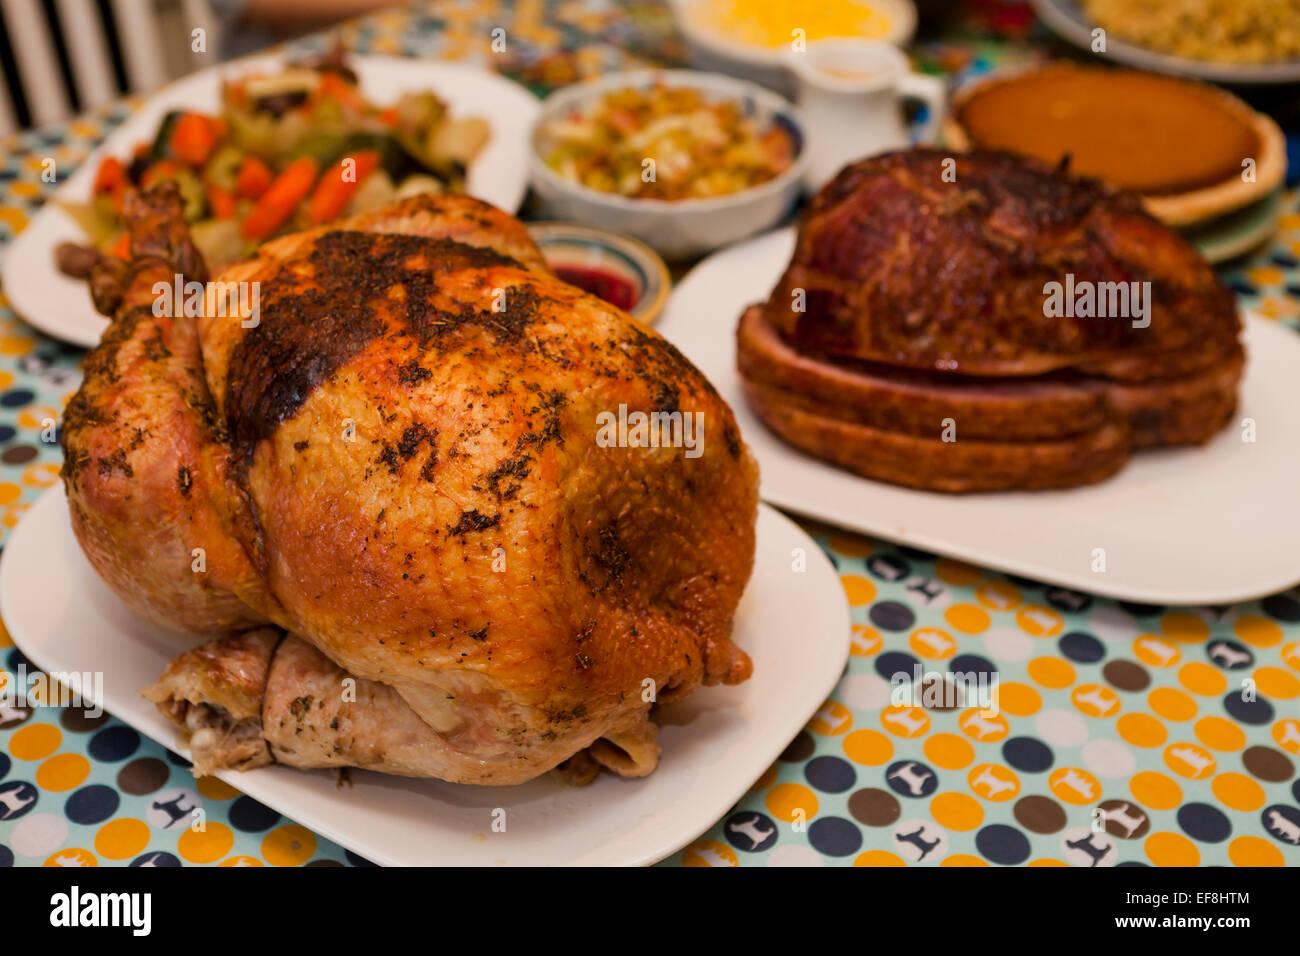 Thanksgiving Stockfotos & Thanksgiving Bilder - Alamy